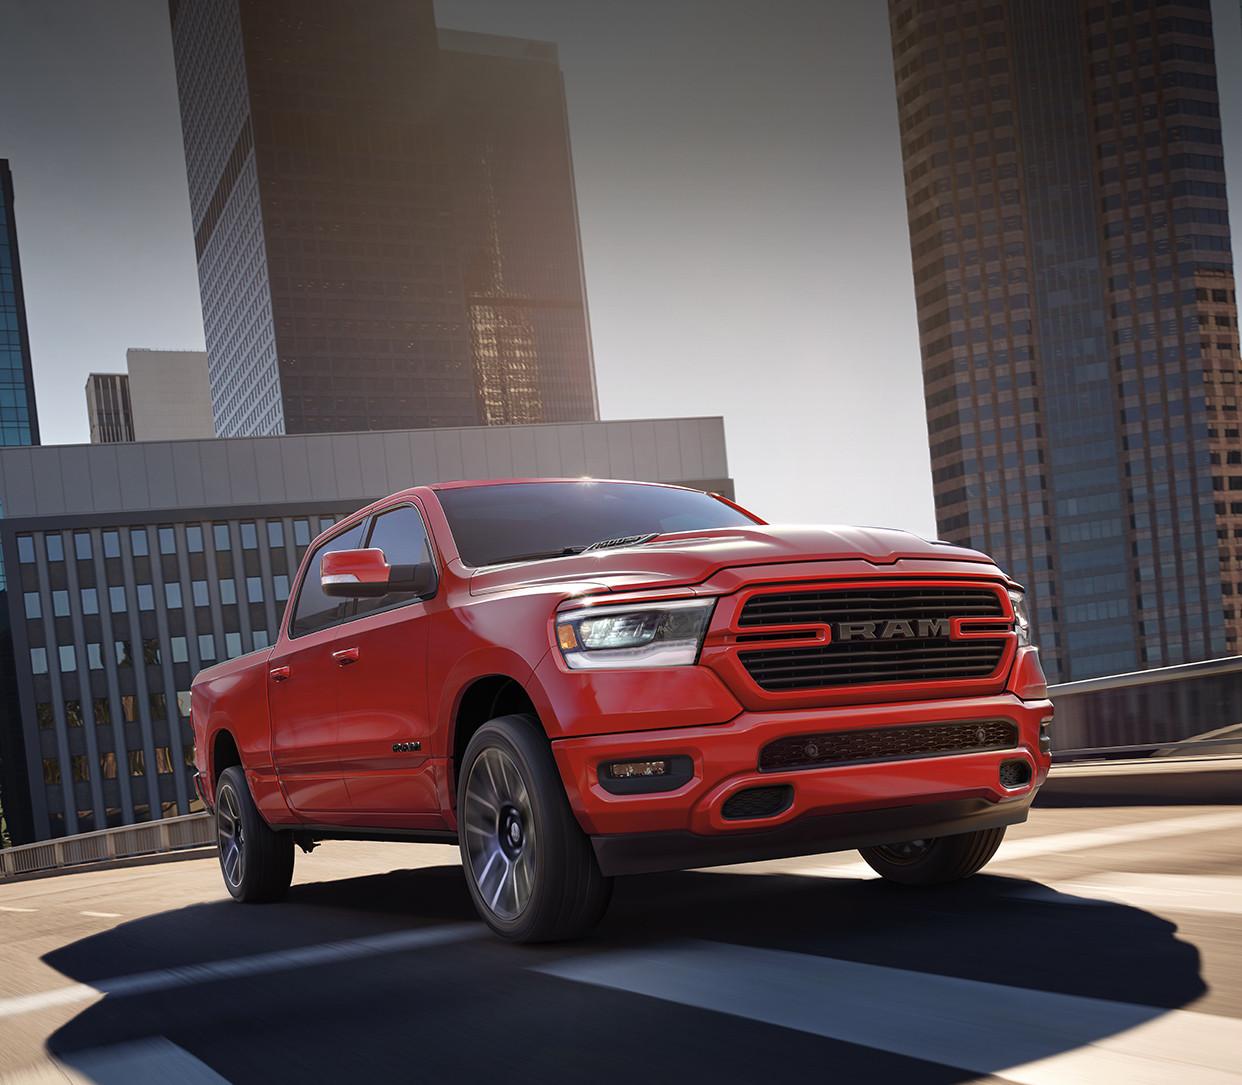 All-New 2019 RAM 1500 Truck